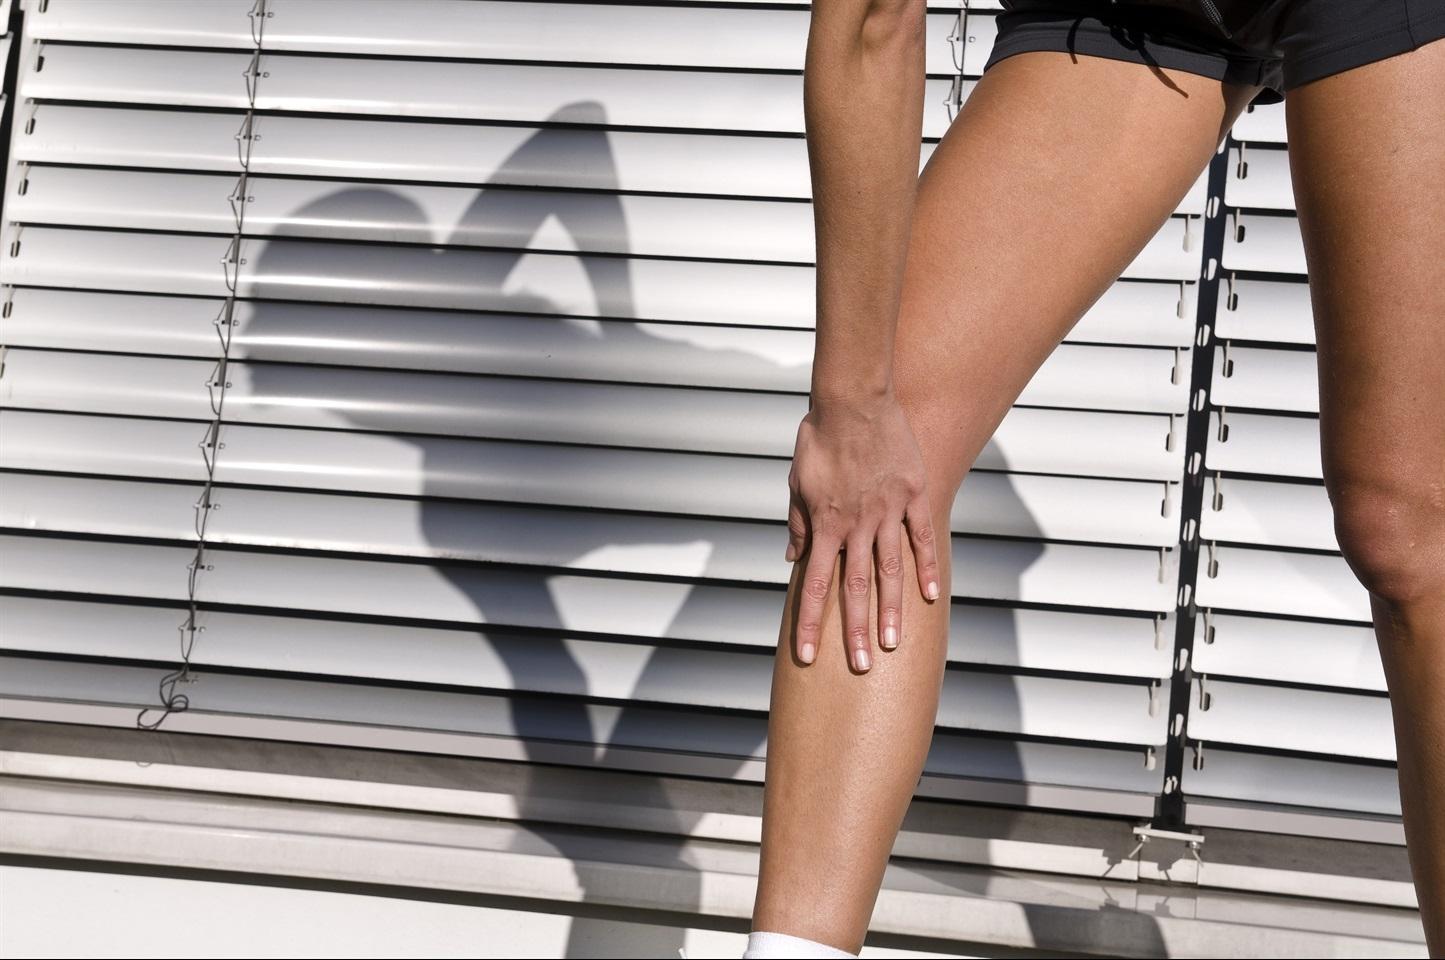 glutei e gambe dimagranti